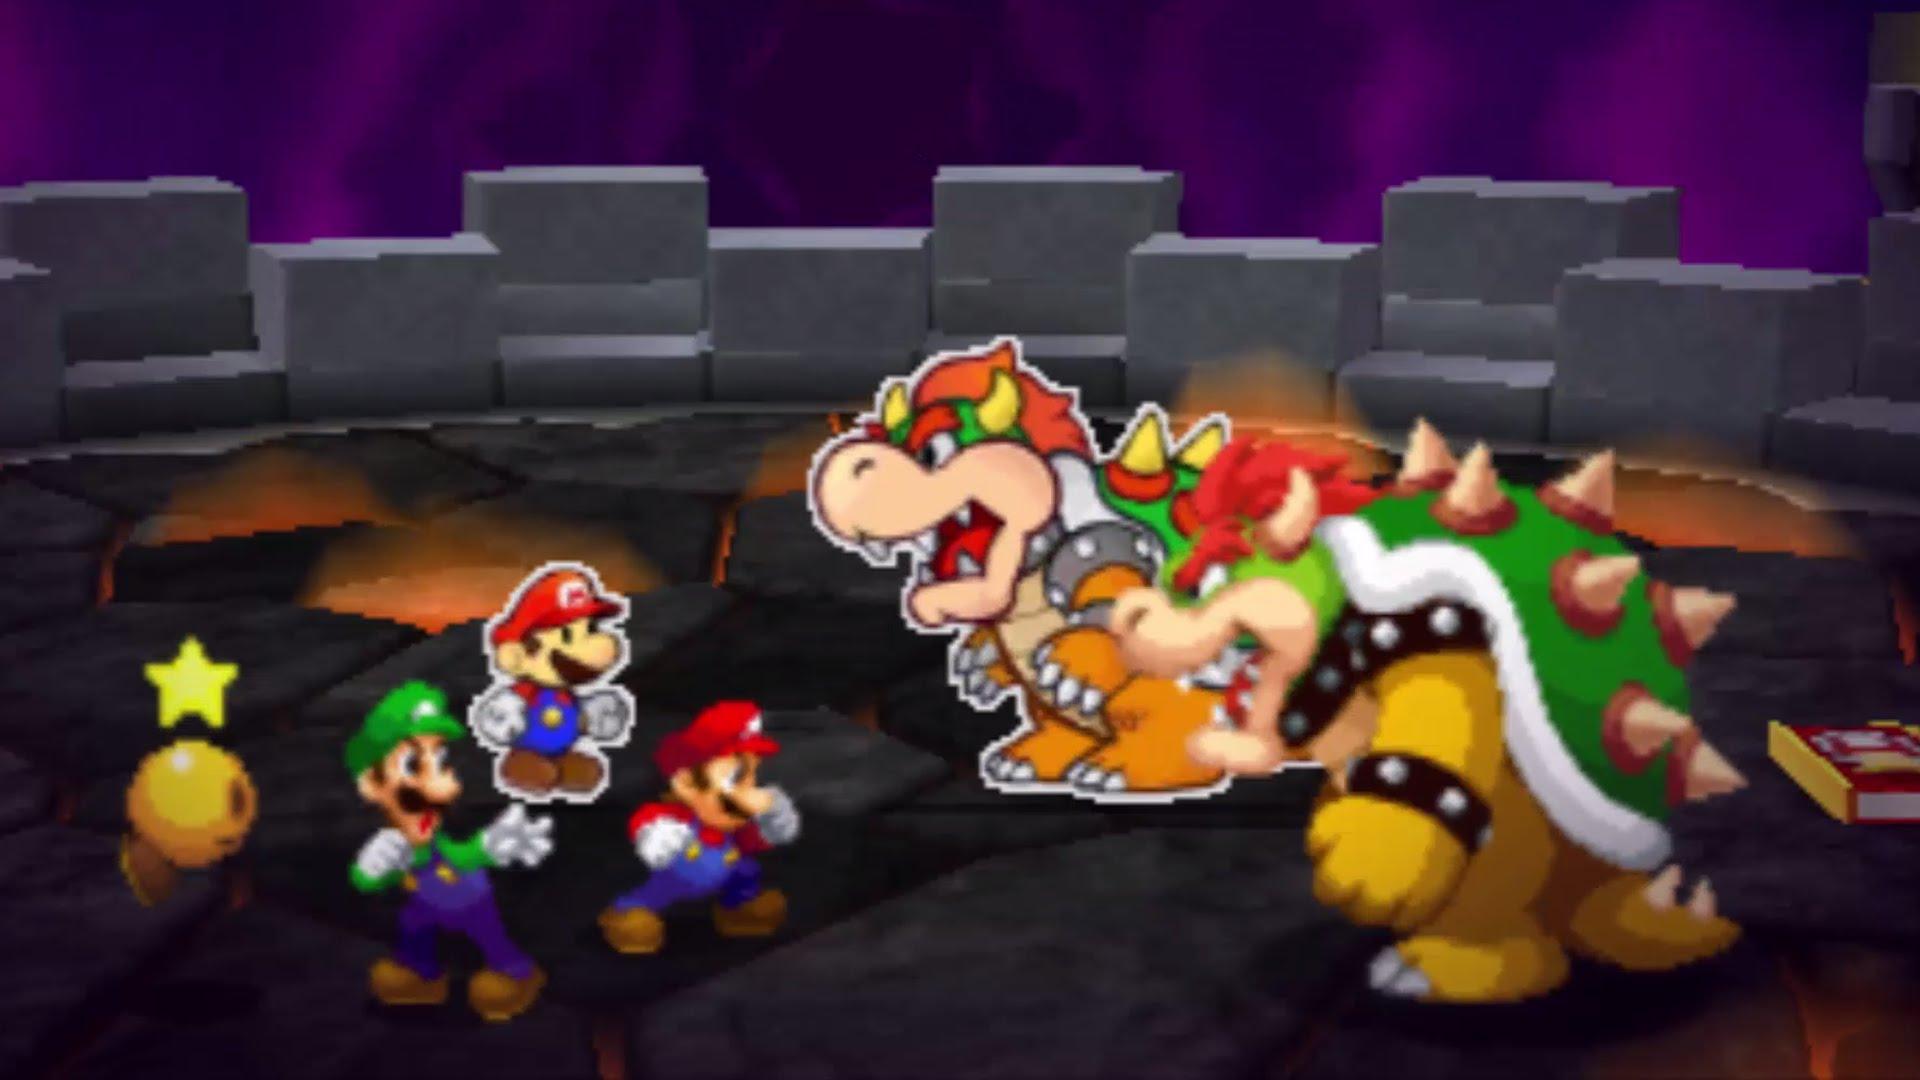 Most Viewed Mario Luigi Paper Jam Wallpapers 4k Wallpapers